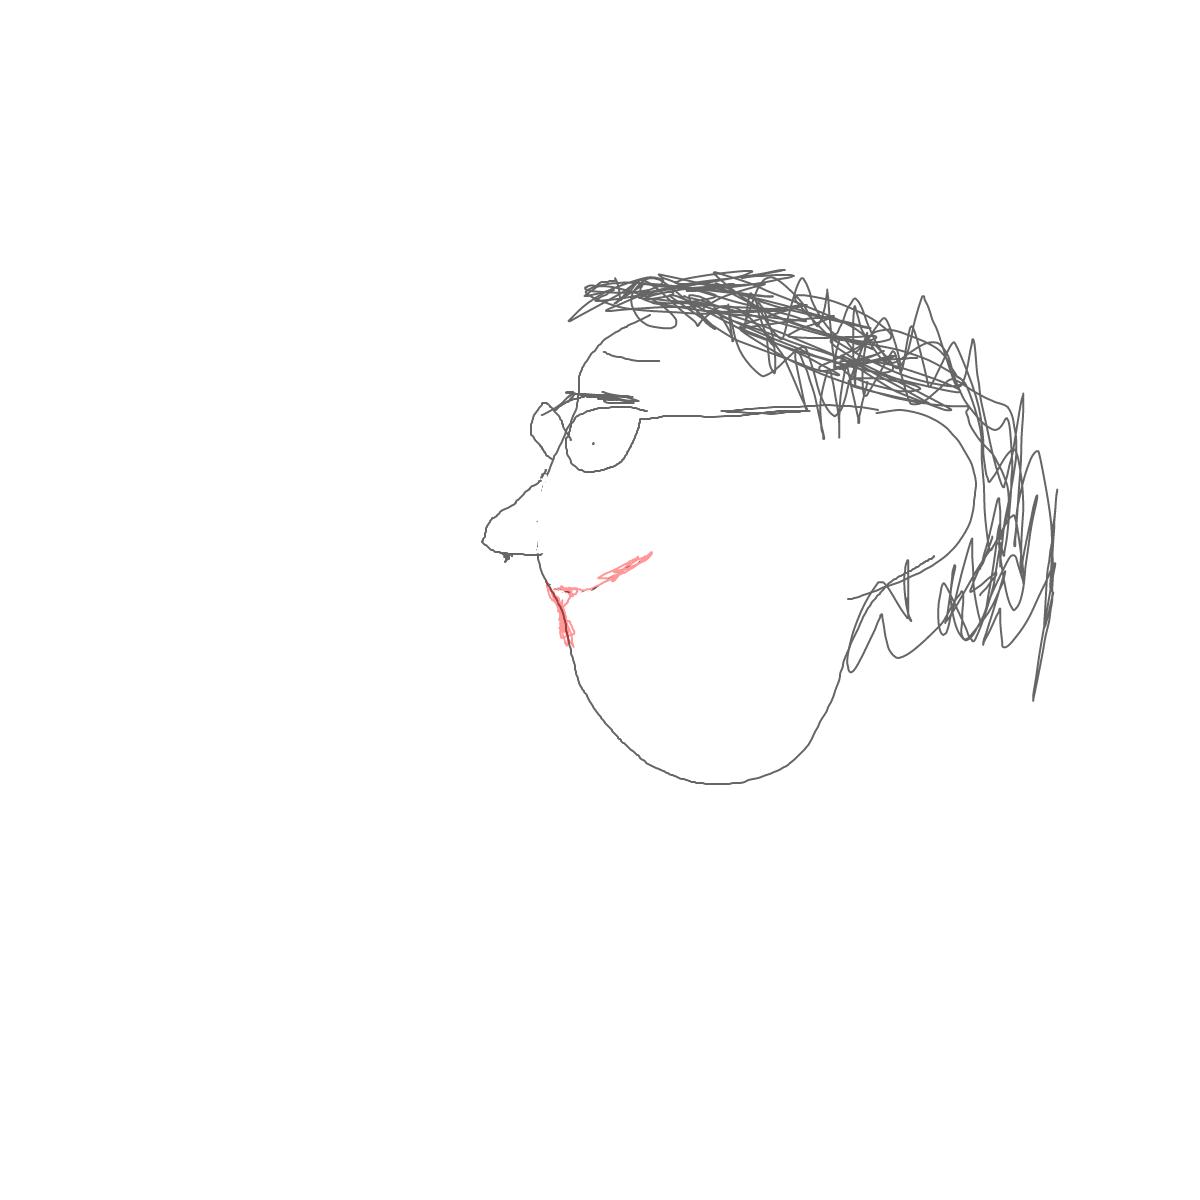 BAAAM drawing#17353 lat:51.2067413330078100lng: 3.2589836120605470